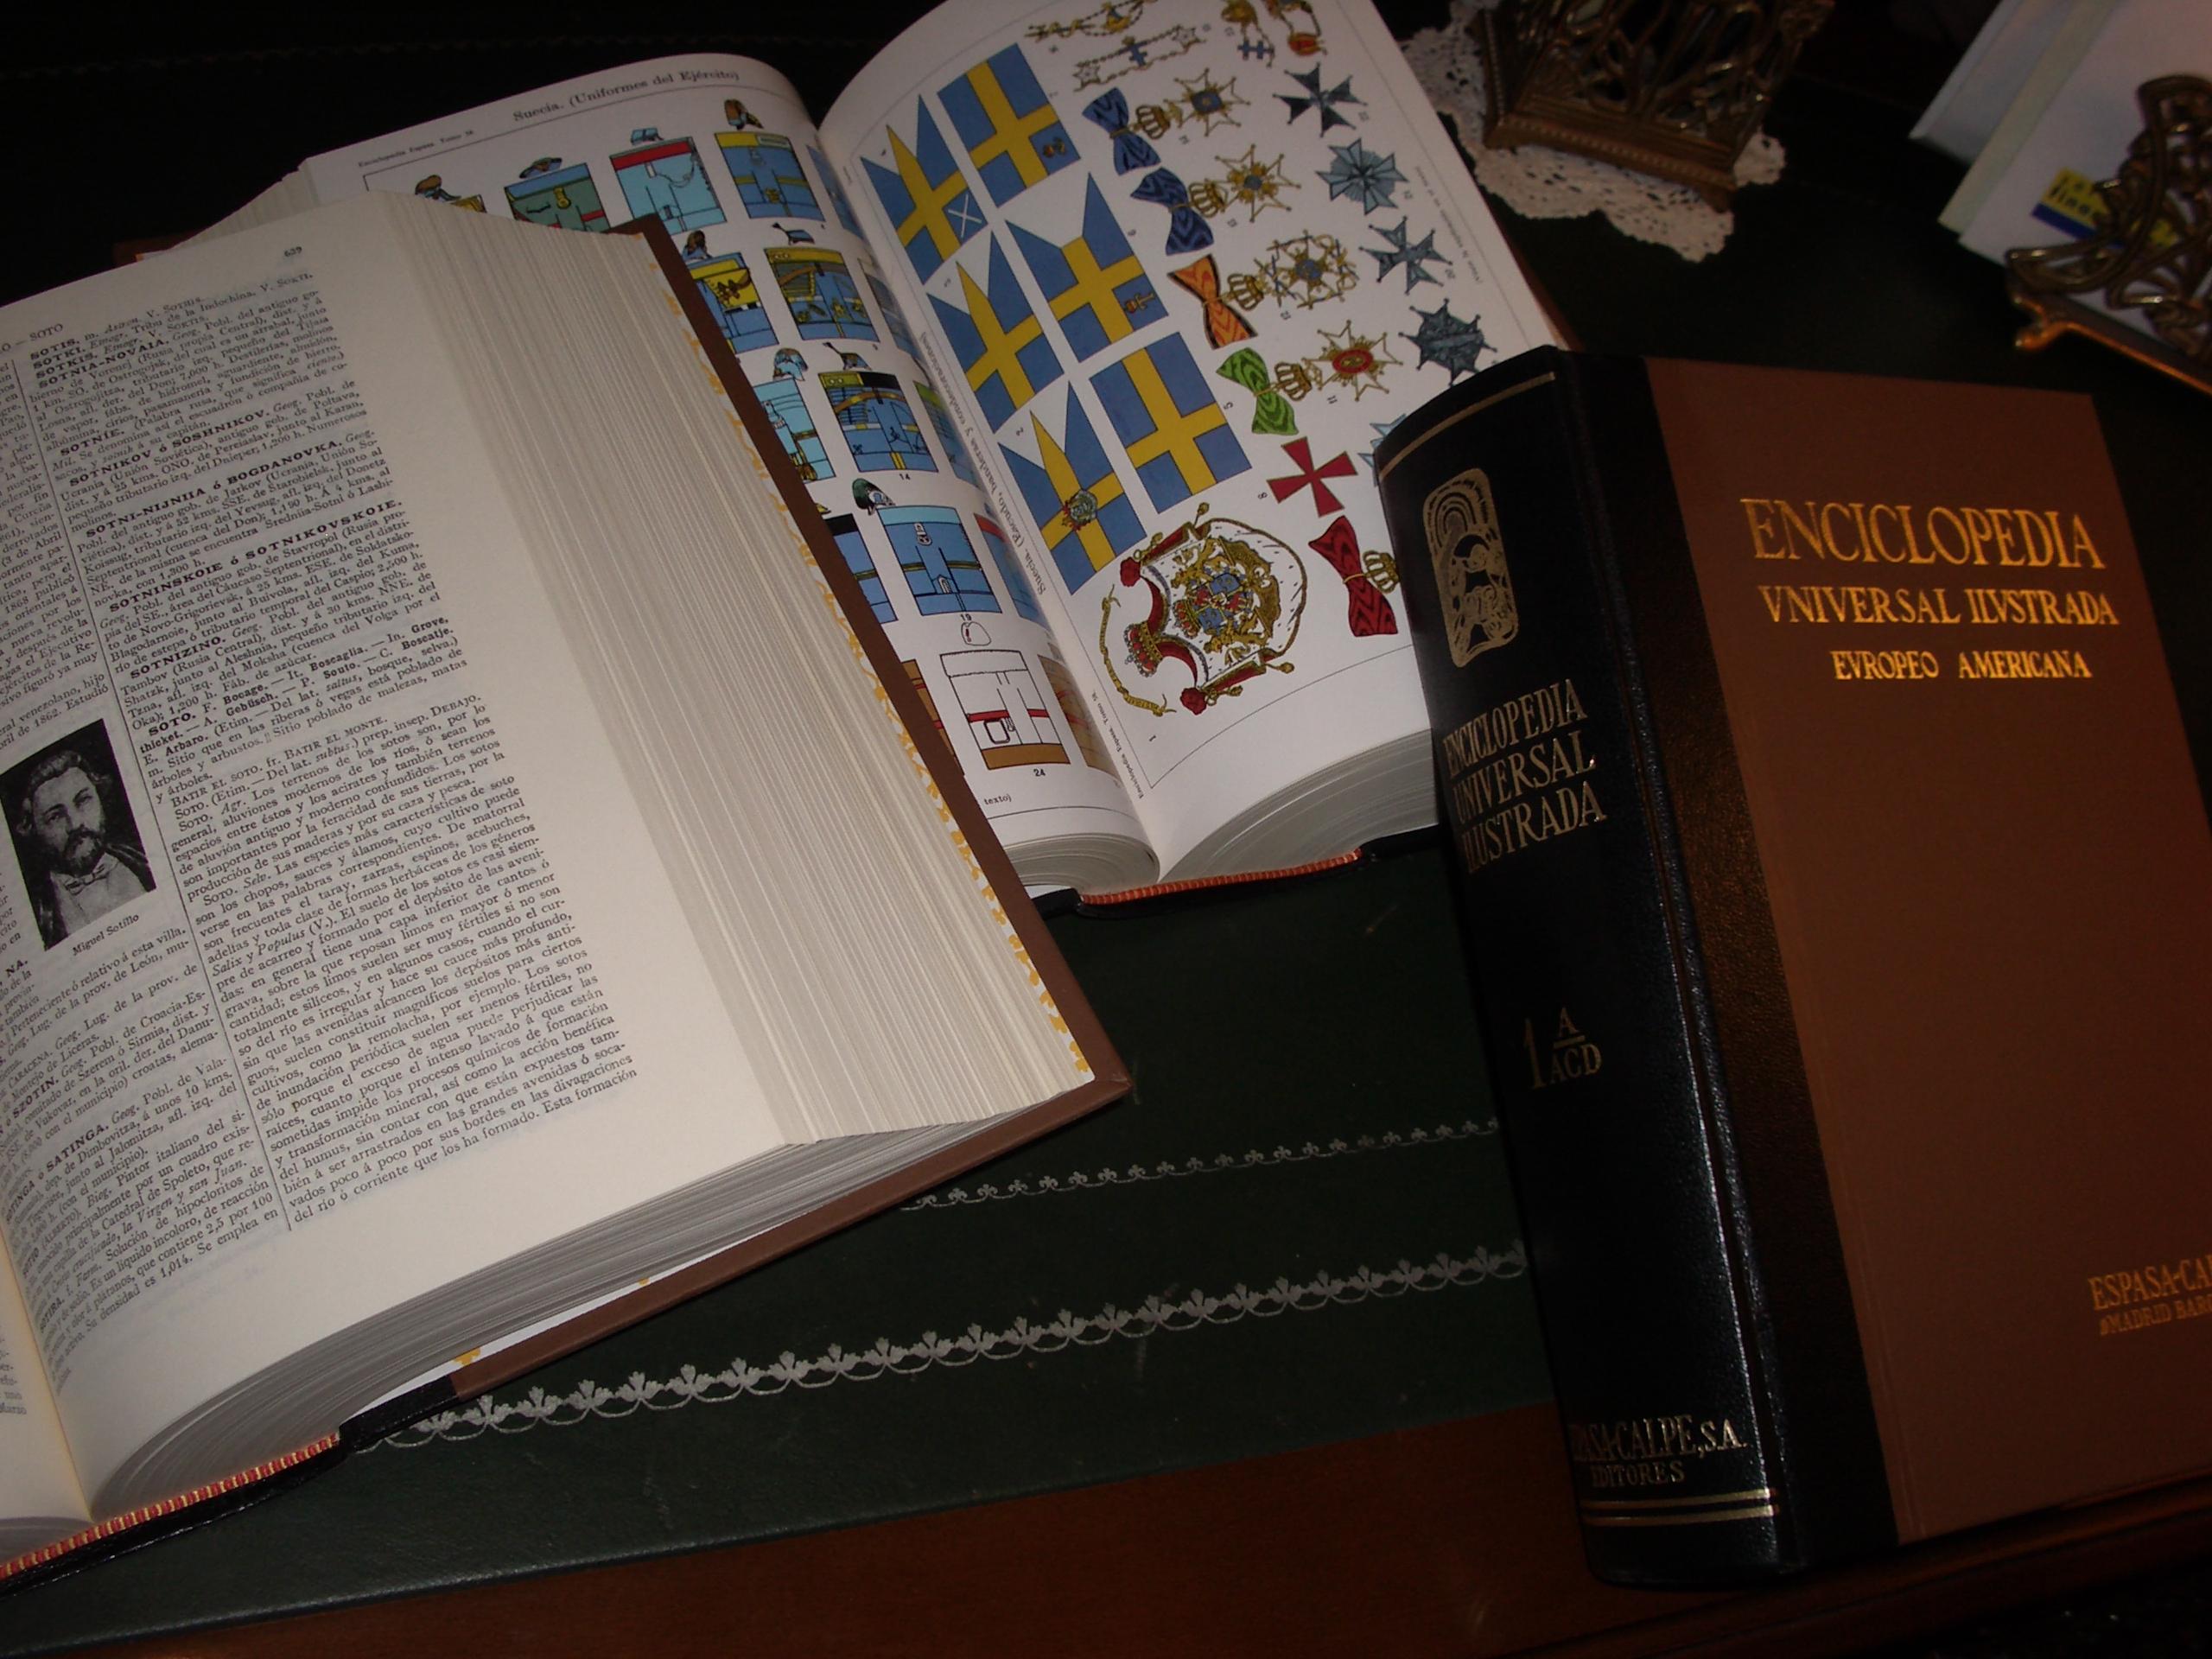 Depiction of Enciclopedia Espasa